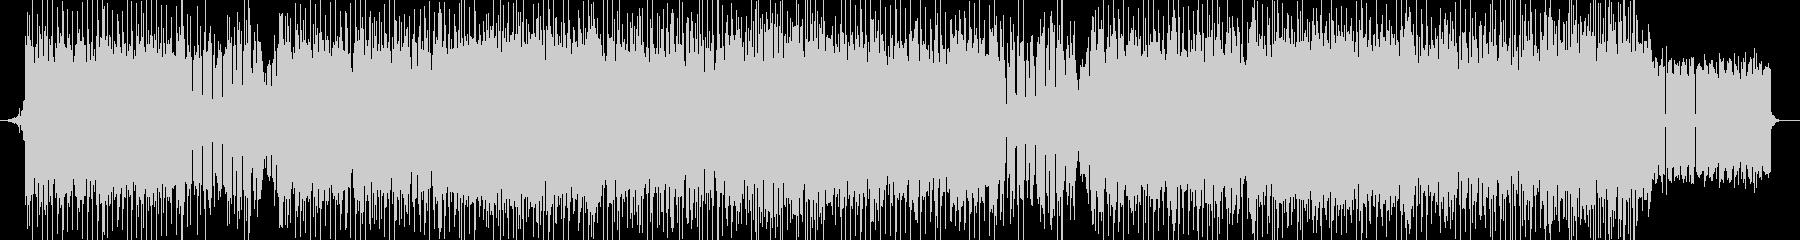 「HARDCORE/ダーク」BGM233の未再生の波形